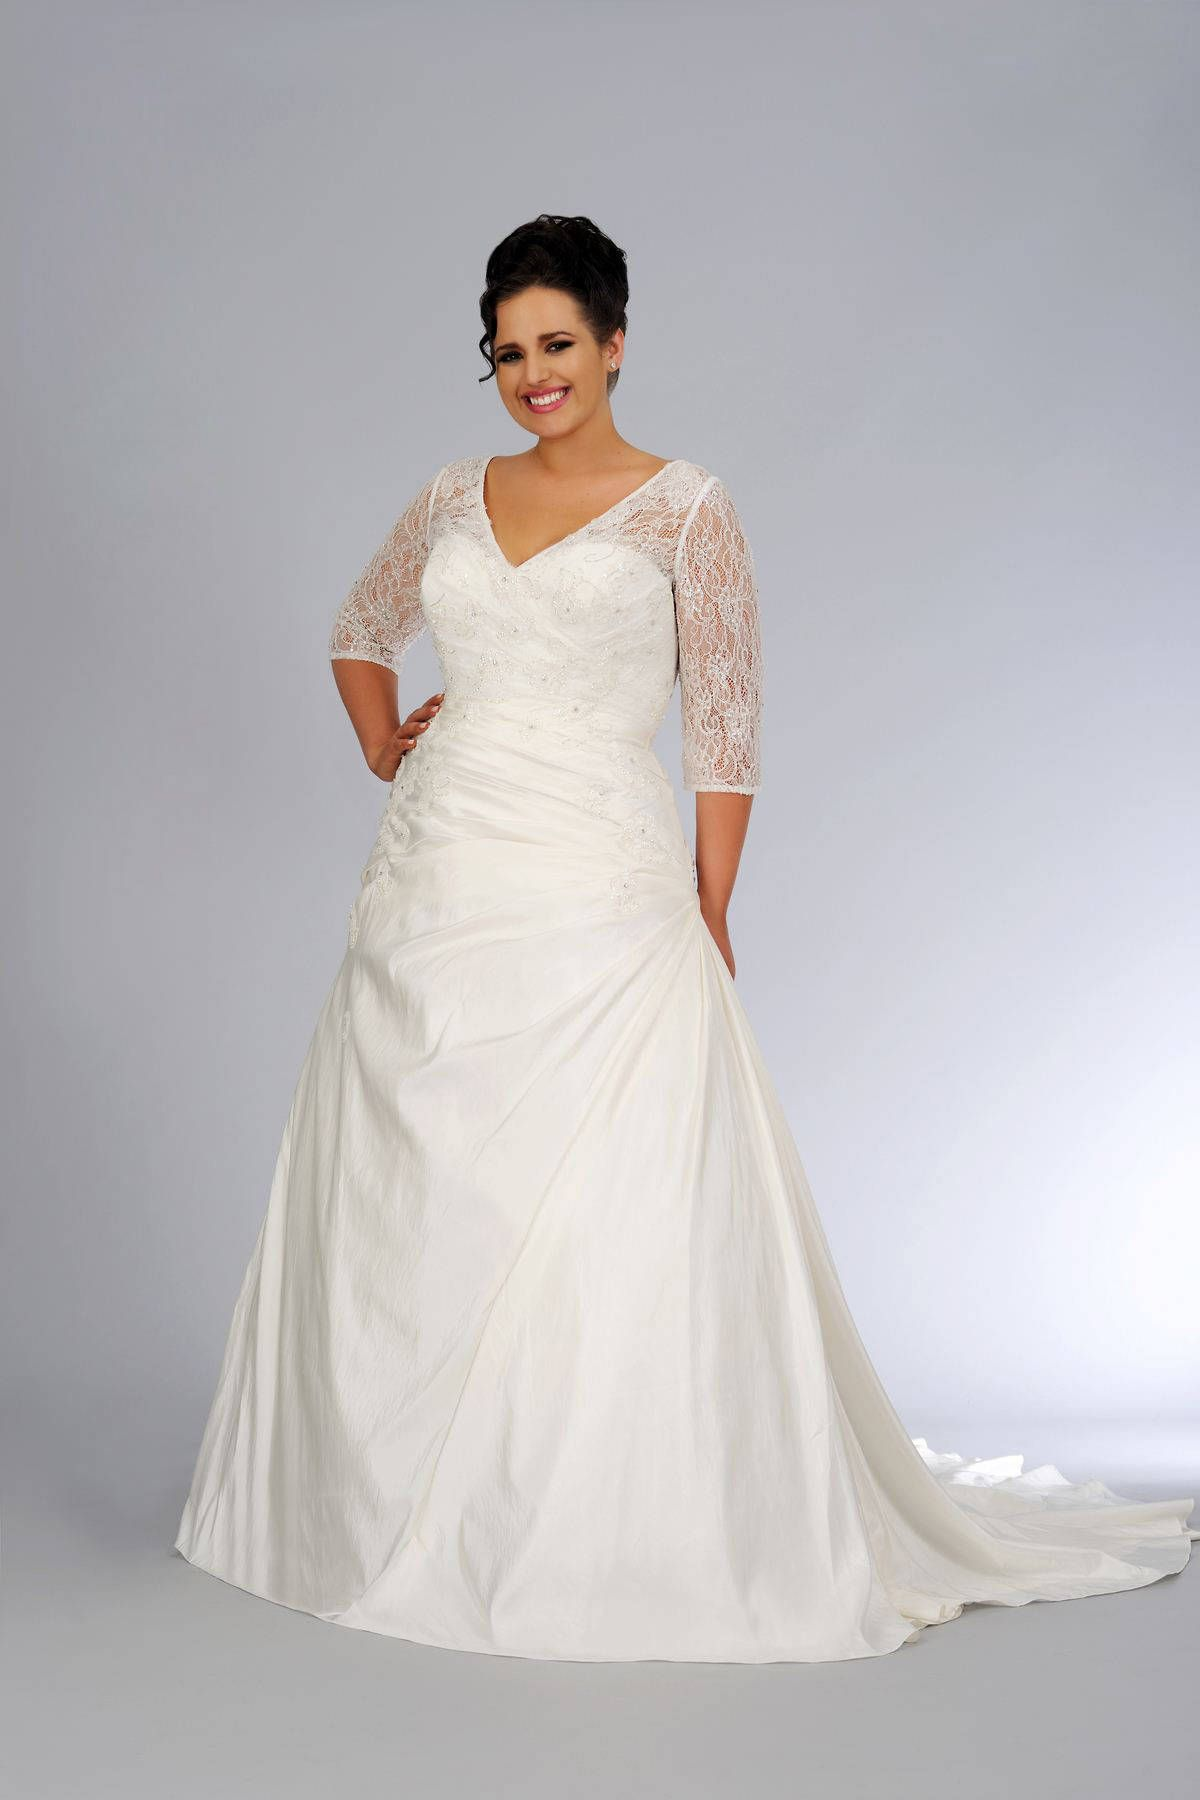 Plus Size 3 4 Sleeve Wedding Gown By Darius Bridal Plus Size Wedding Dresses With Sleeves Plus Size Bridal Dresses Custom Wedding Dress [ 1800 x 1200 Pixel ]